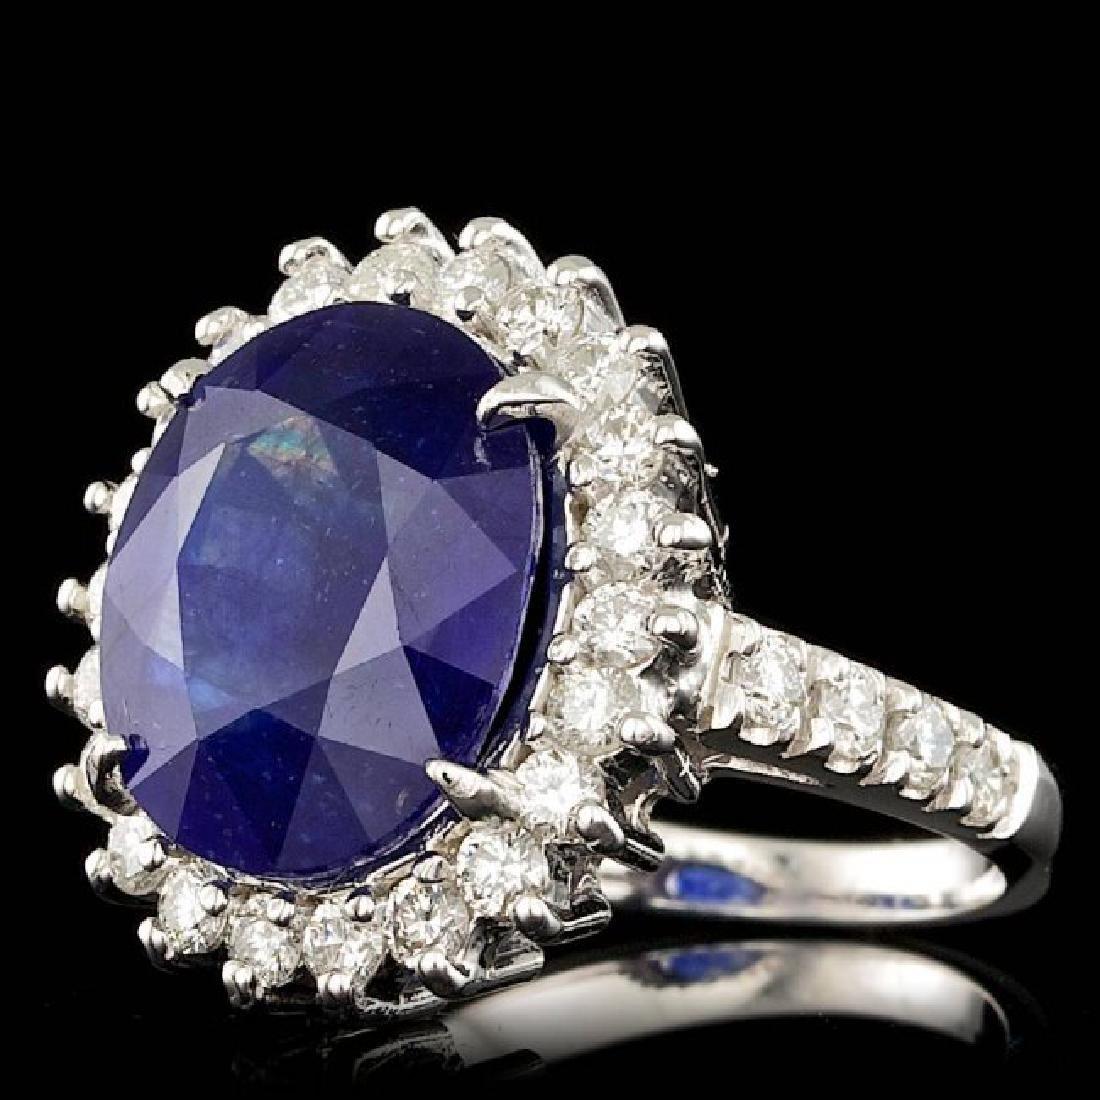 14k Gold 9.00ct Sapphire 1.15ct Diamond Ring - 2